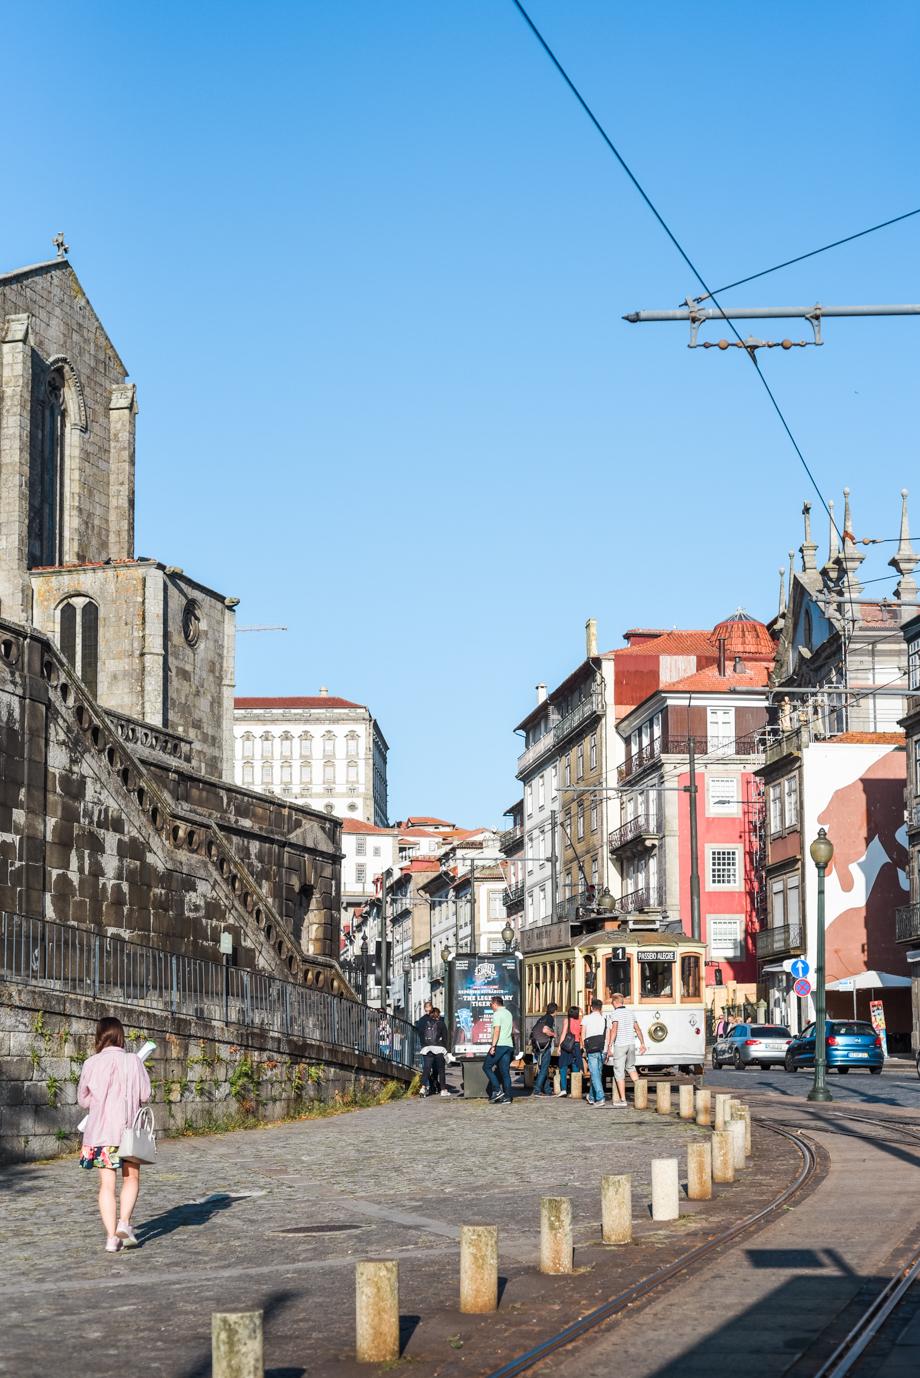 WebQuality-Porto-10yearsVentigrate-AnaisStoelenPhotography-188.jpg